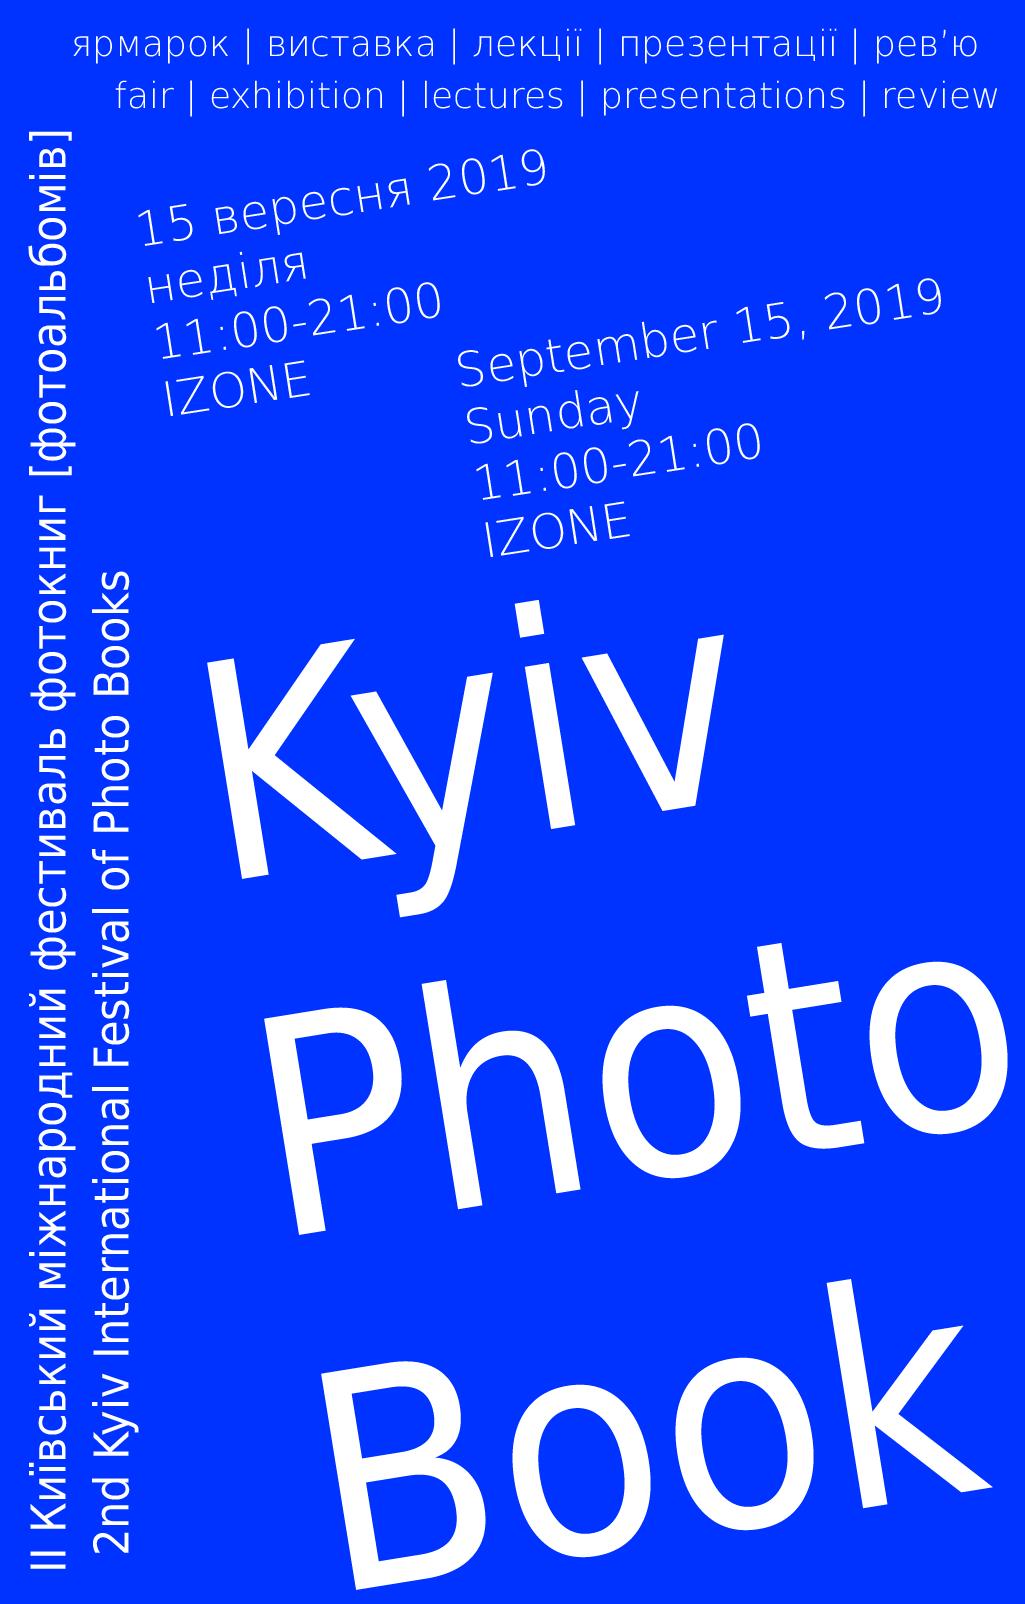 poster_2019_sep.png